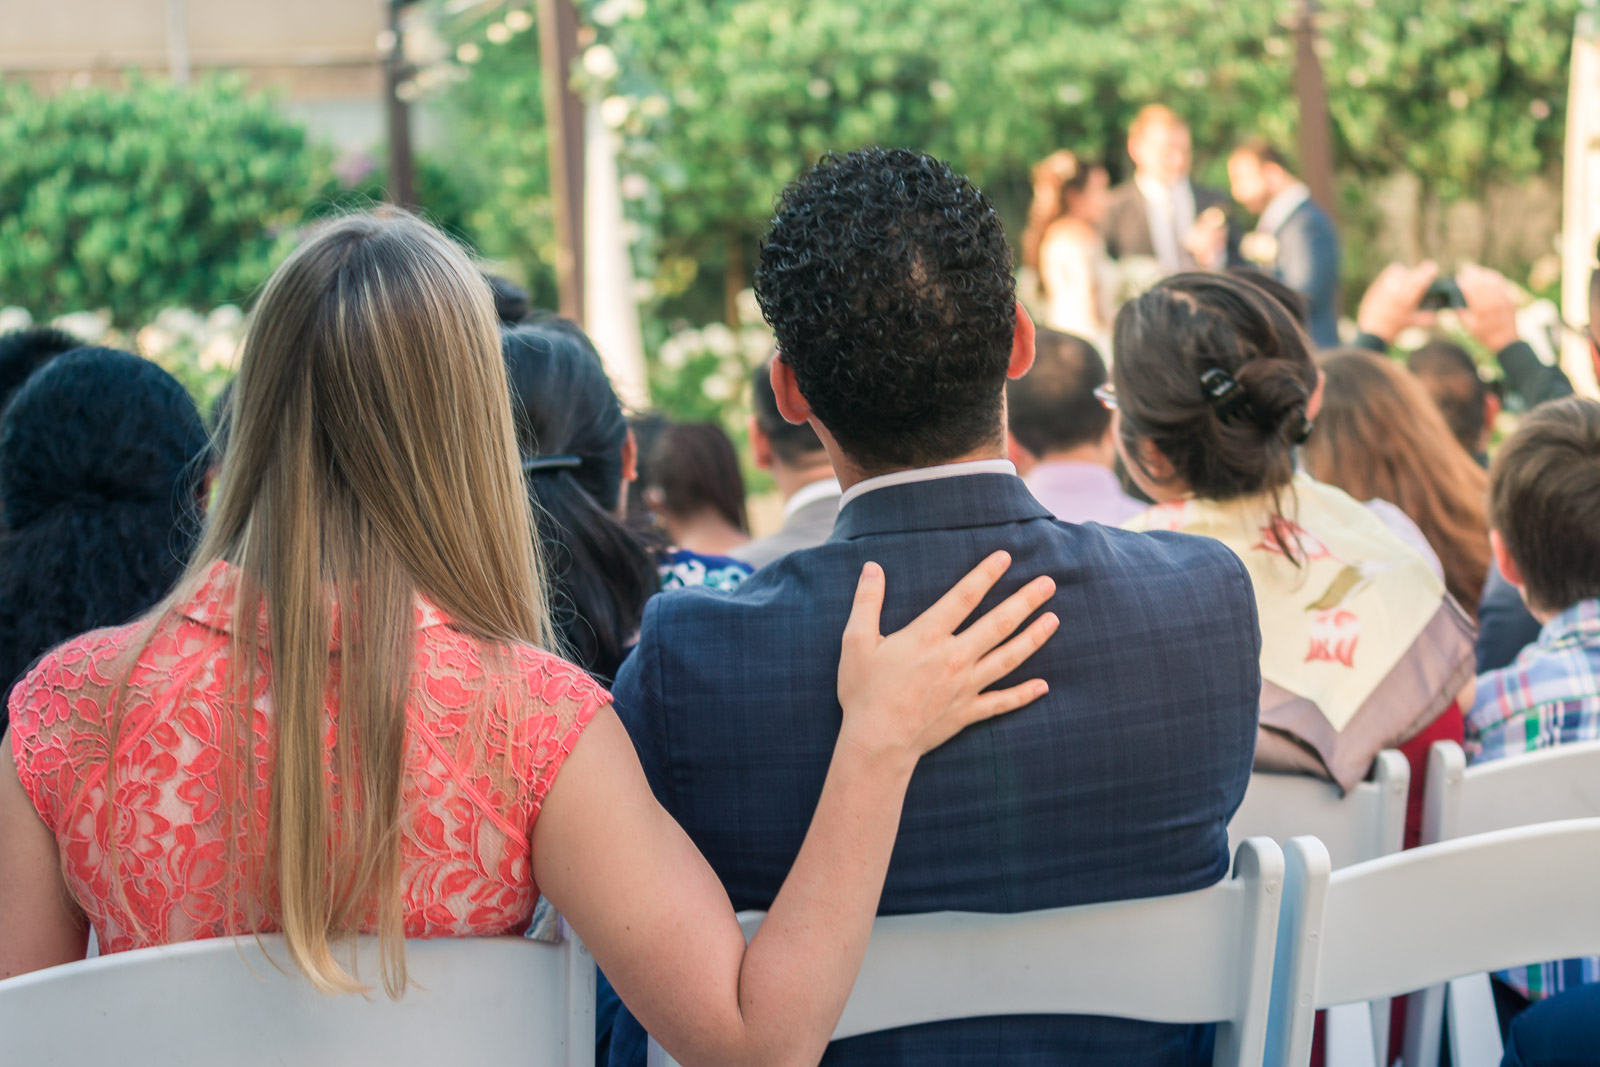 238_Angel-Brea-Orange-County_Joseph-Barber-Wedding-Photography.jpg